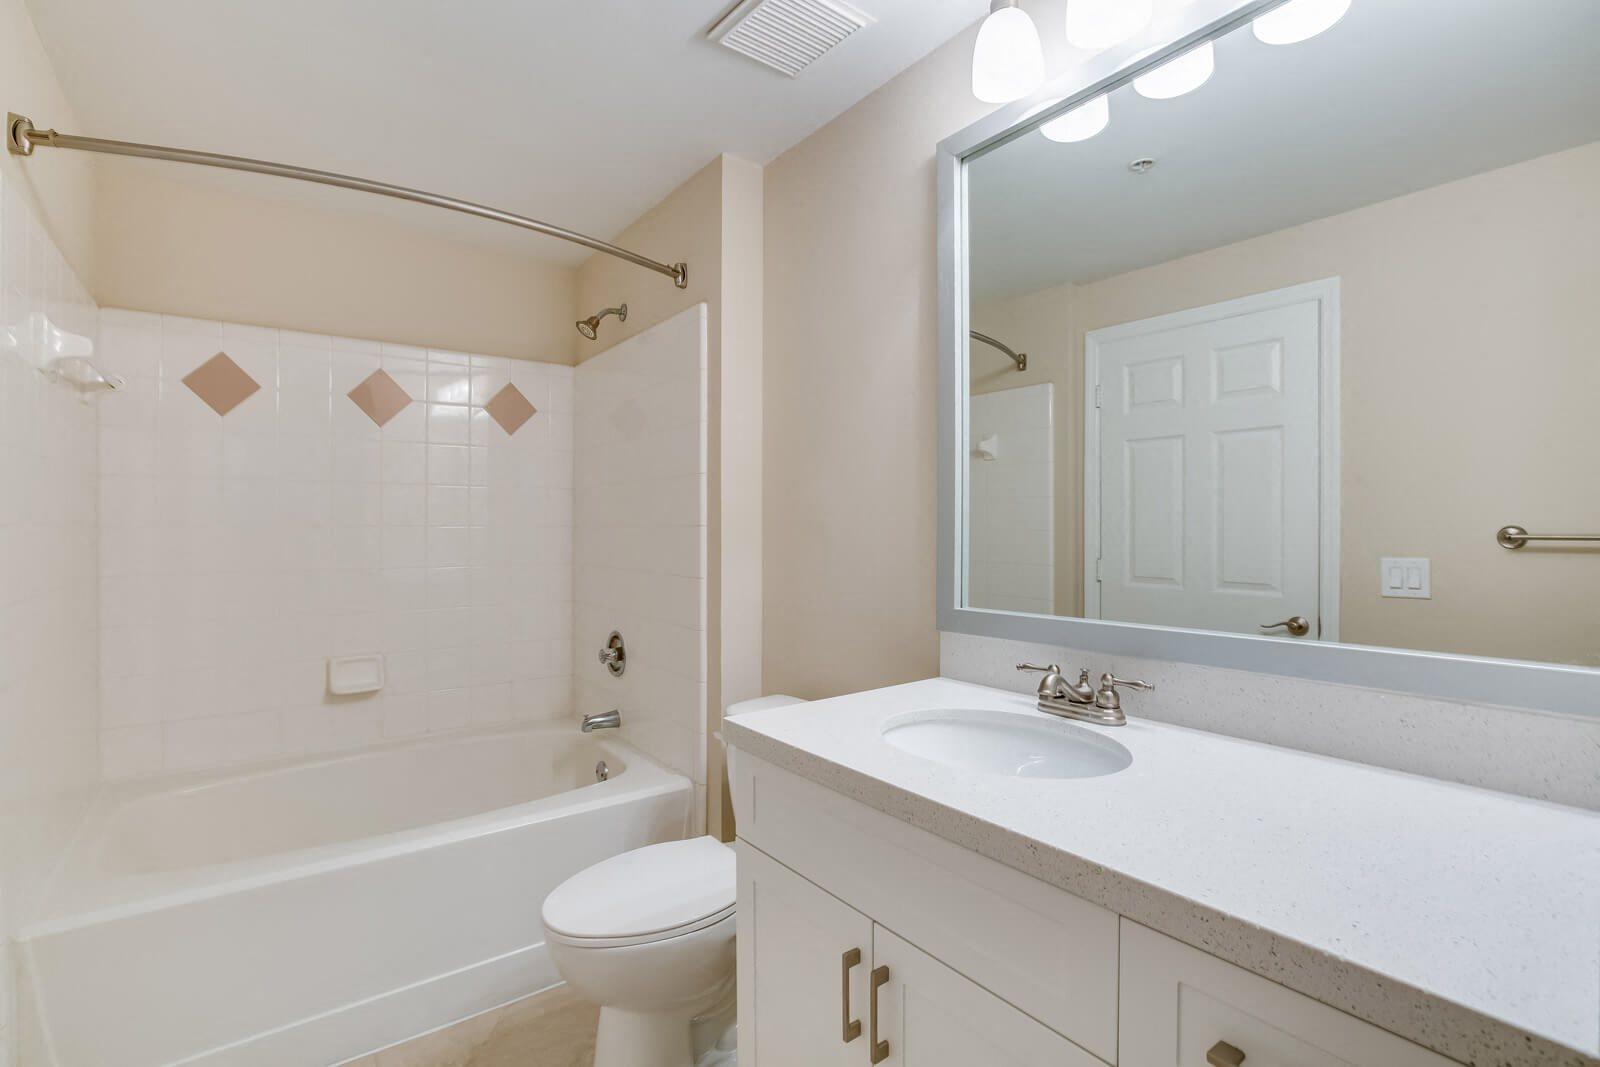 Spacious, Renovated Bathrooms at Windsor at Miramar, Miramar, FL